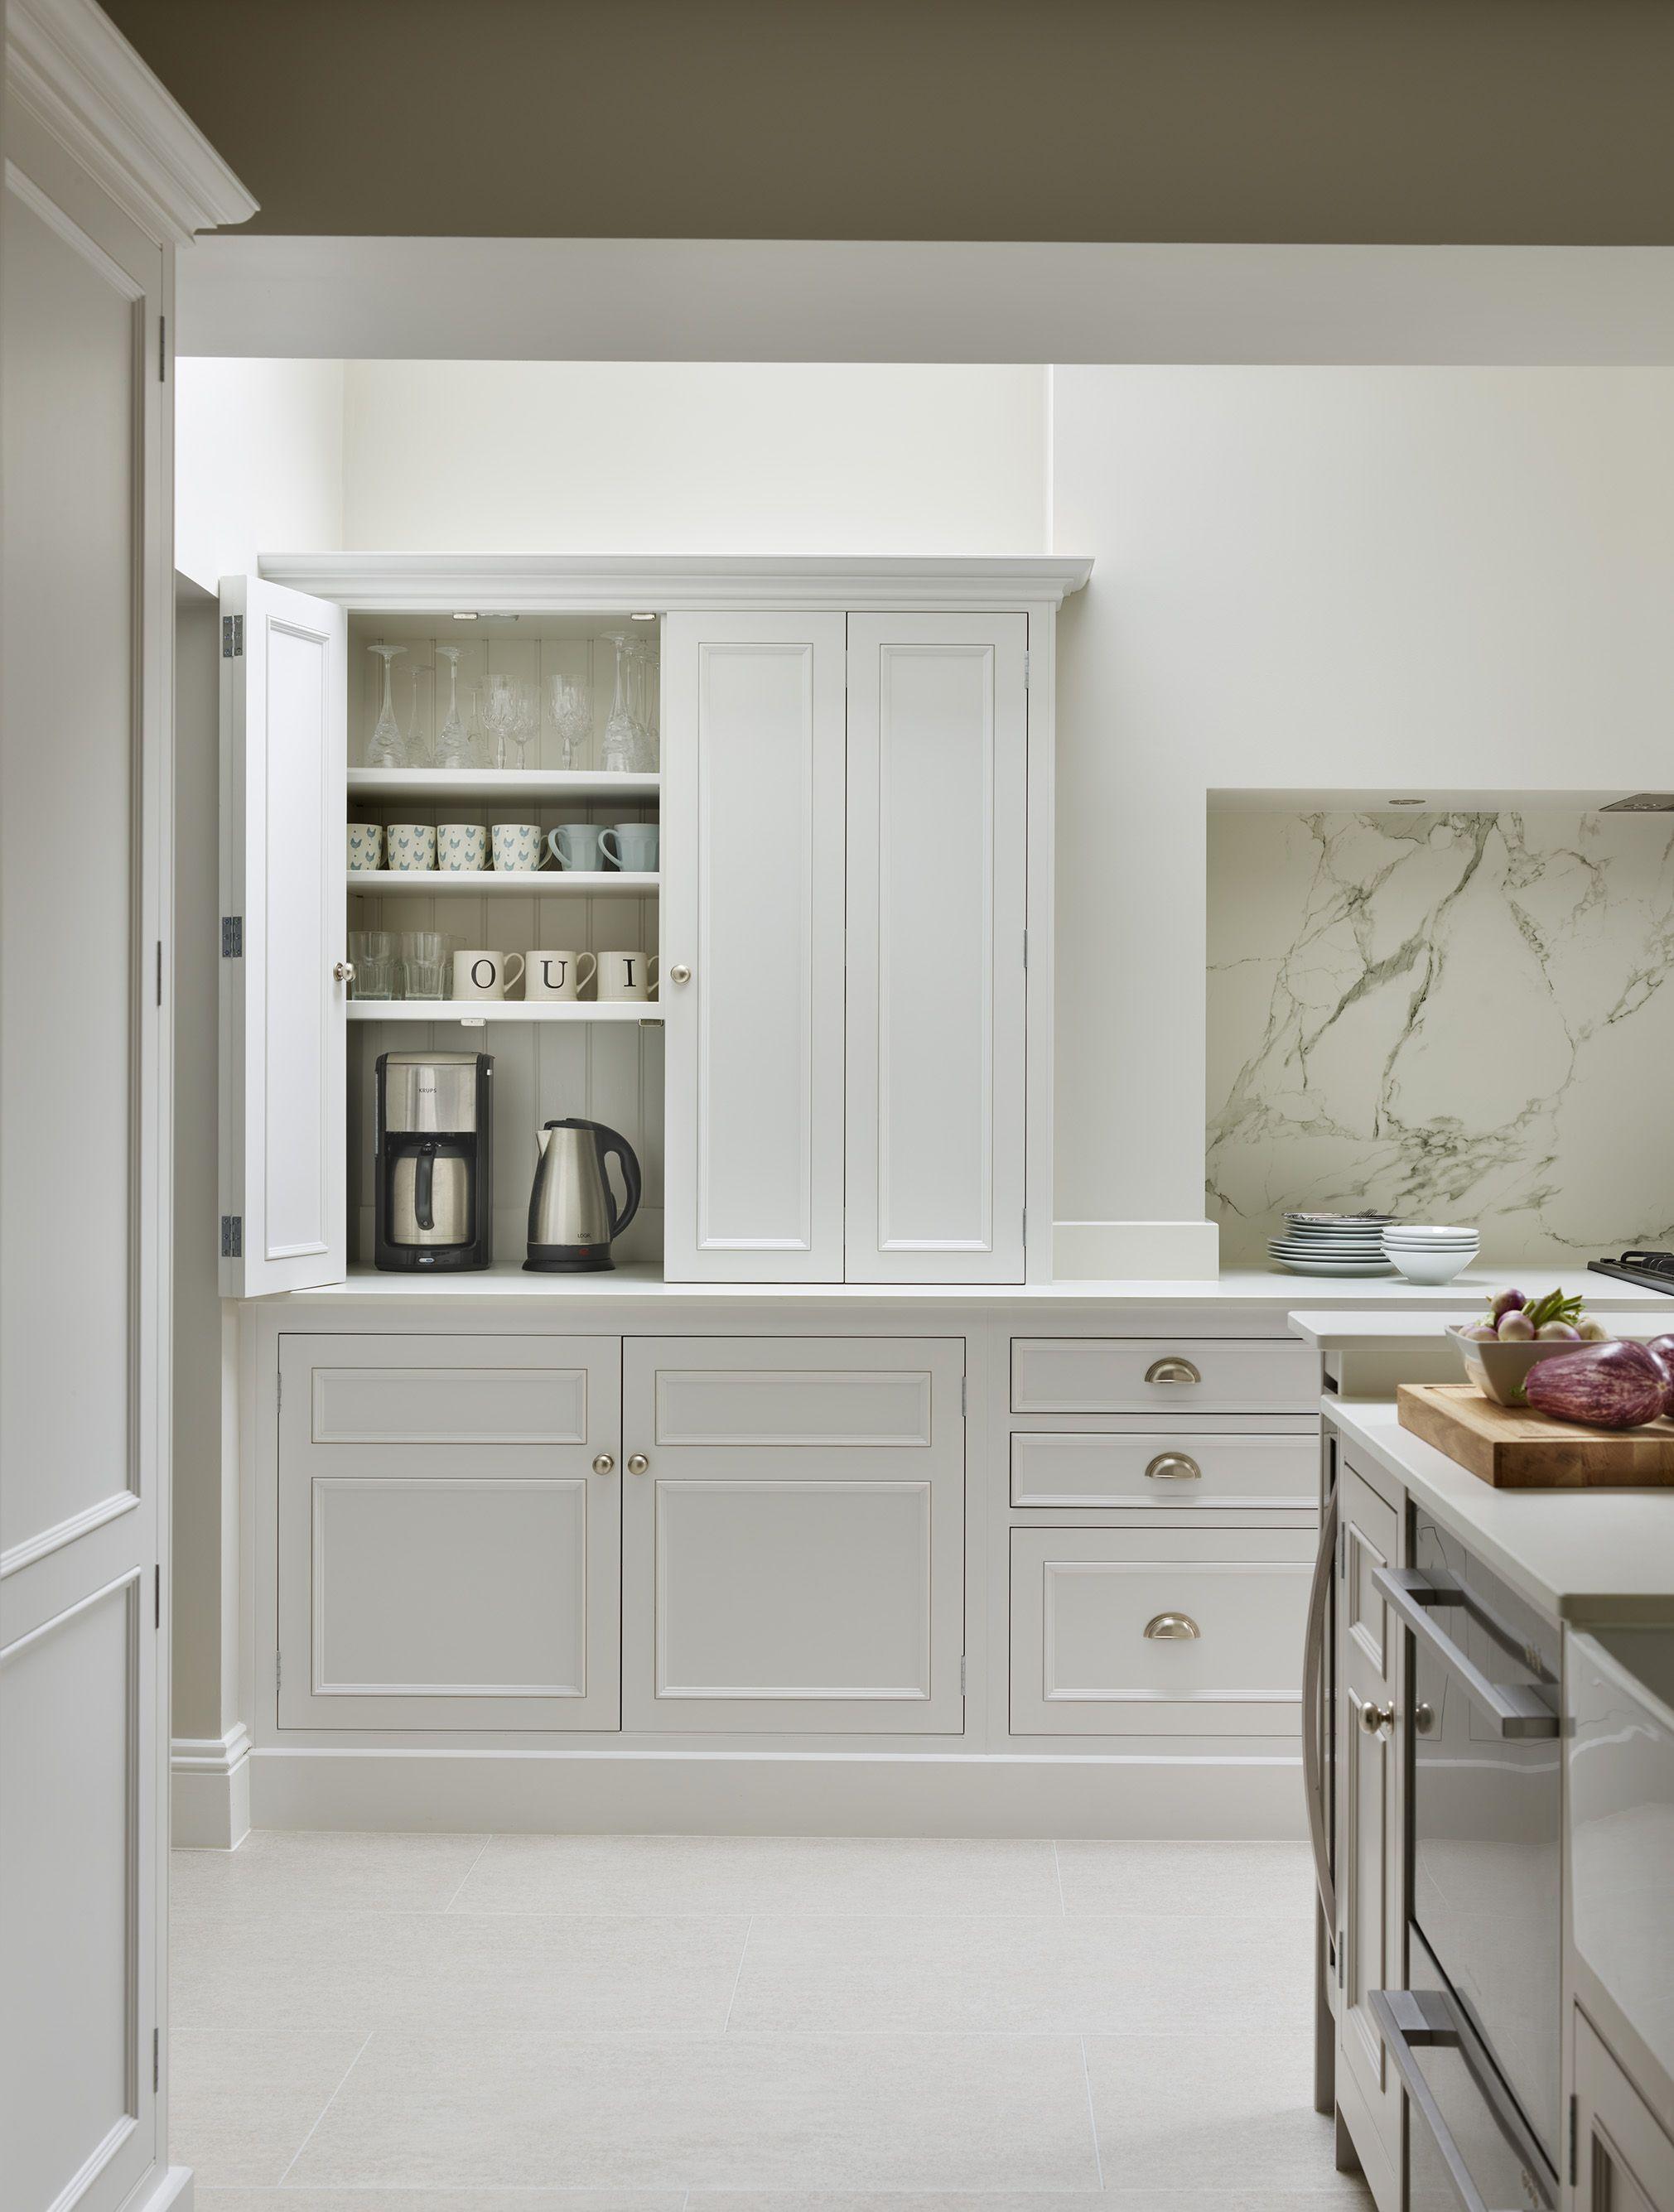 Kitchen | Interior Design | Pinterest | Kitchens, House and Pantry